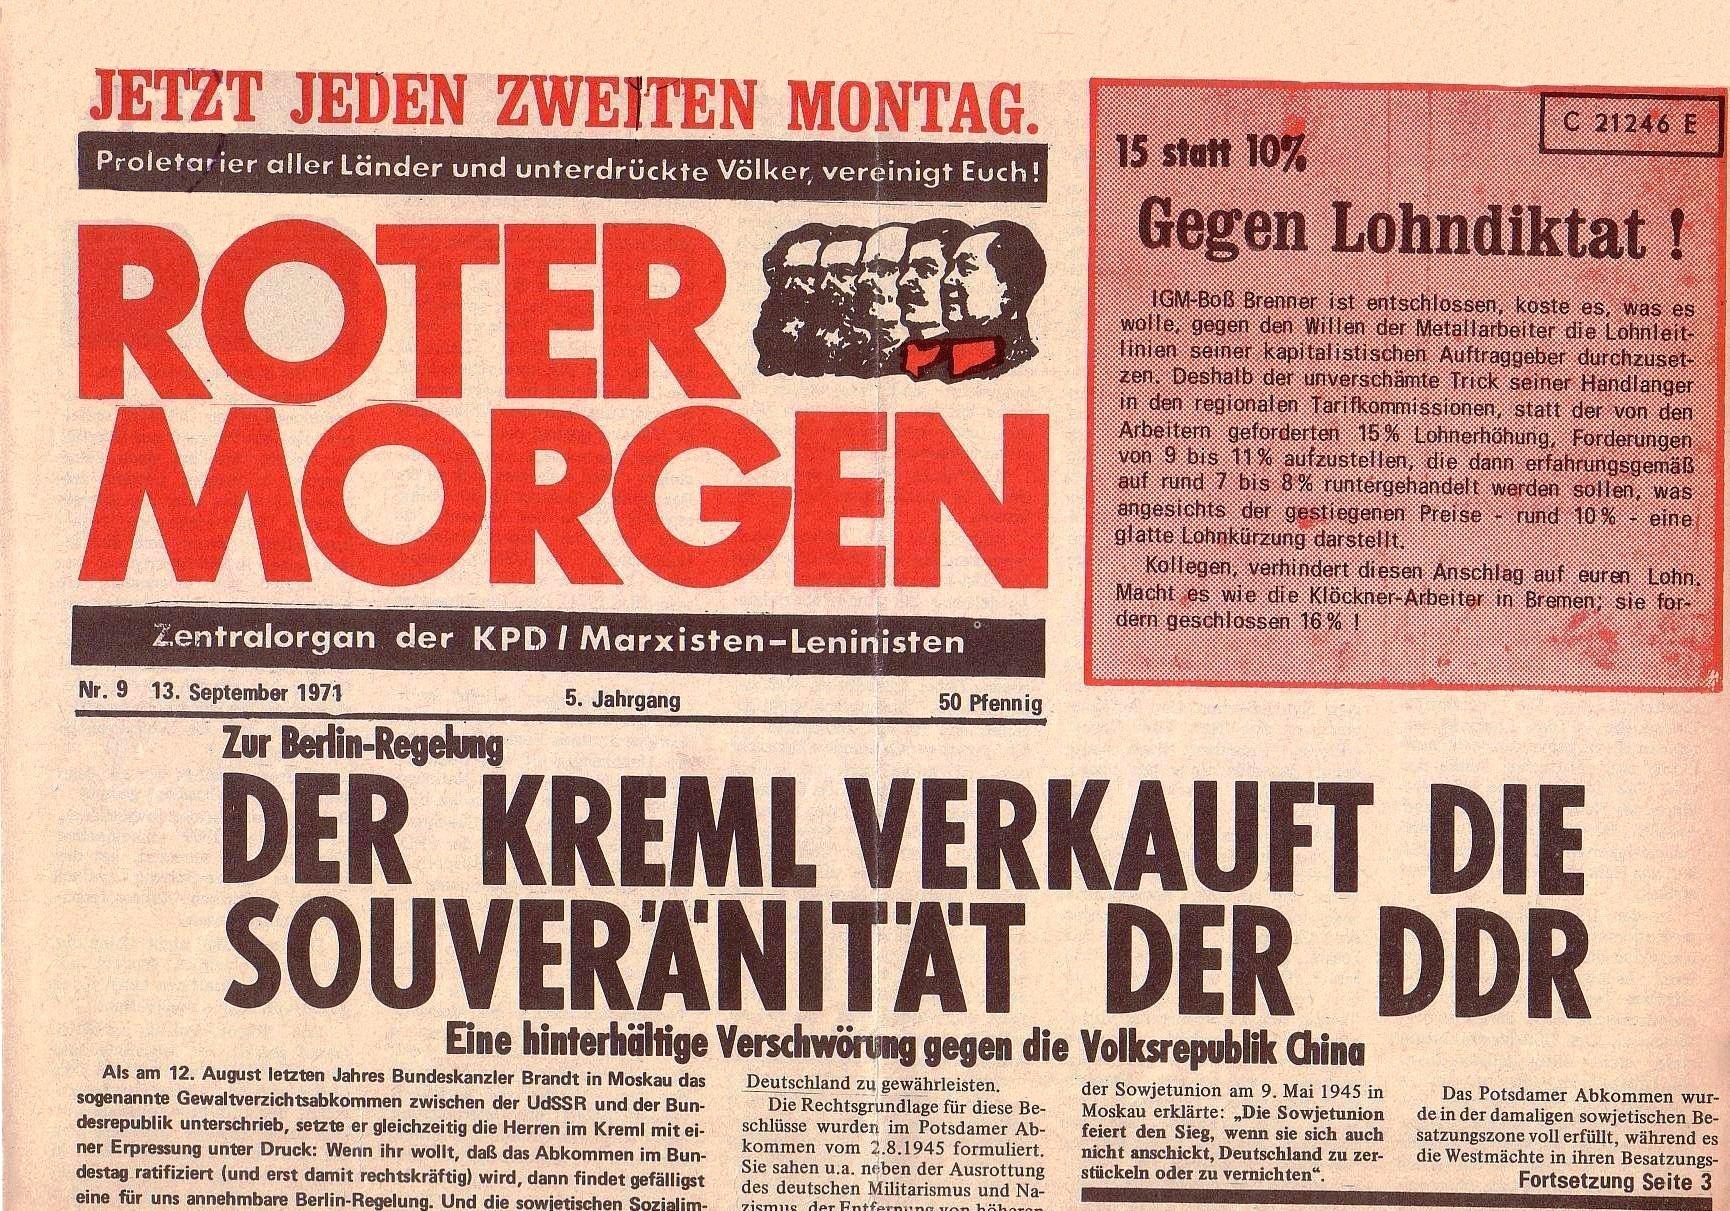 Roter Morgen, 5. Jg., 13. September 1971, Nr. 9, Seite 1a